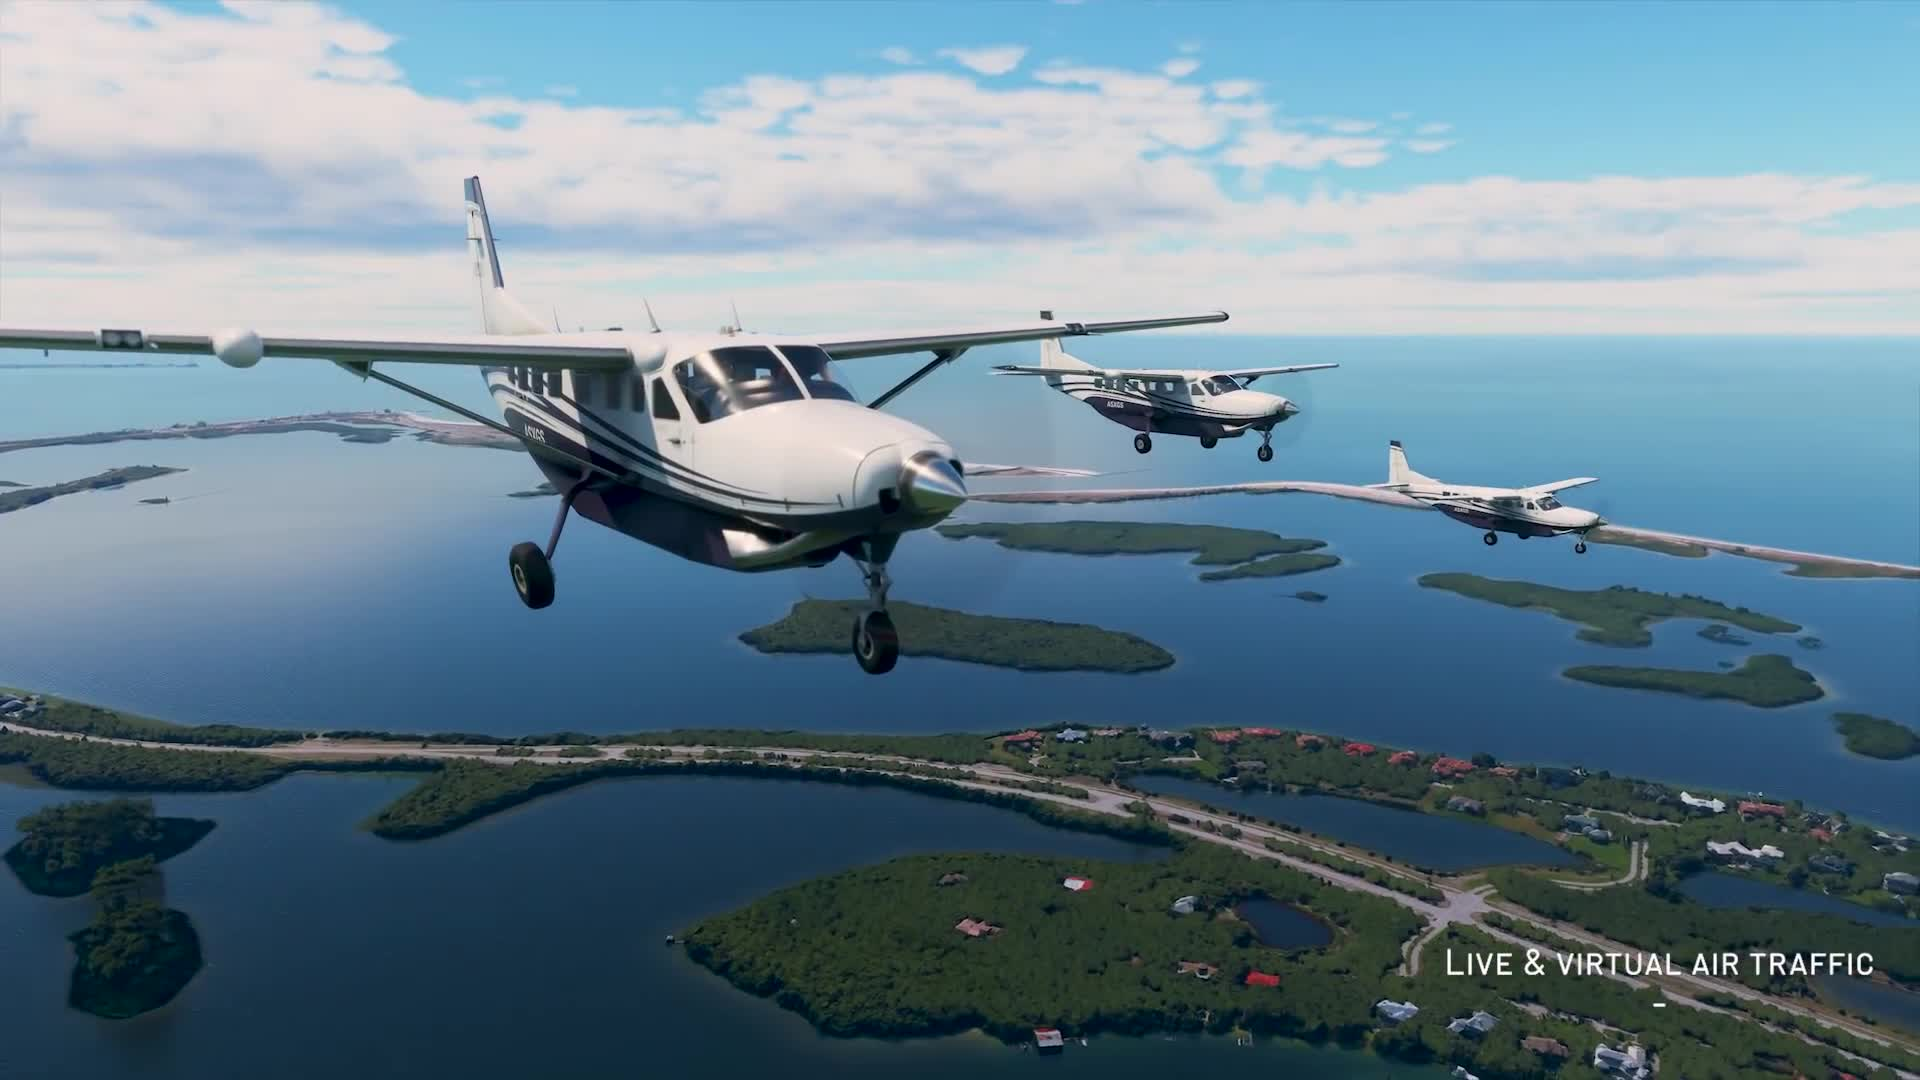 Microsoft, Multiplayer, Simulation, flugsimulation, Flight Simulator, Microsoft Flight Simulator, Flugsimulator, Microsoft Flight Simulator 2020